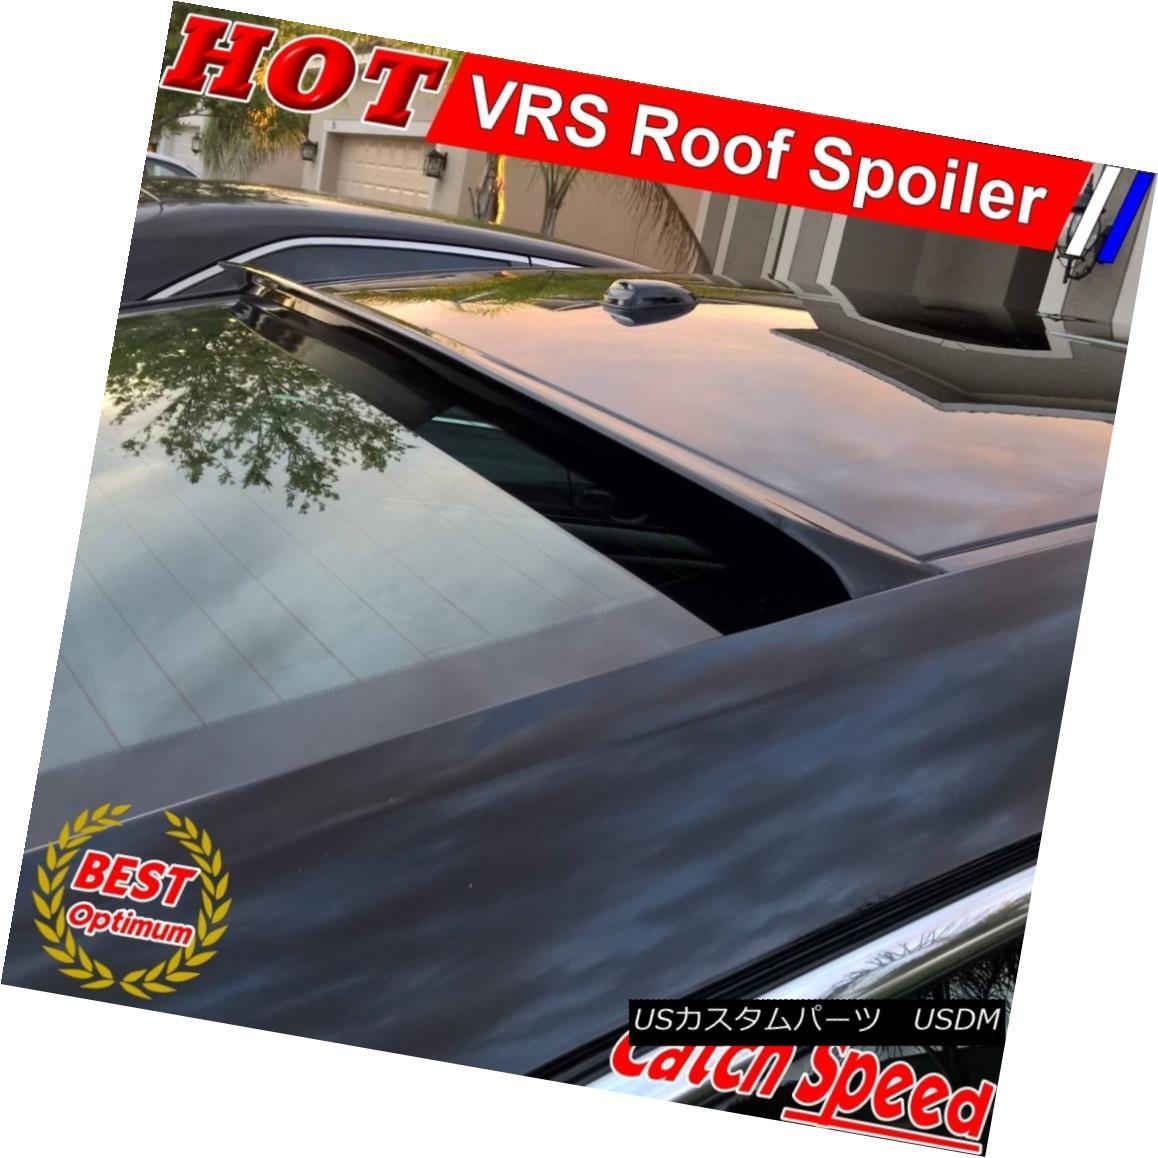 For 2010-2015 CHEVROLET CAMARO-Rear Window Roof Spoiler Unpainted